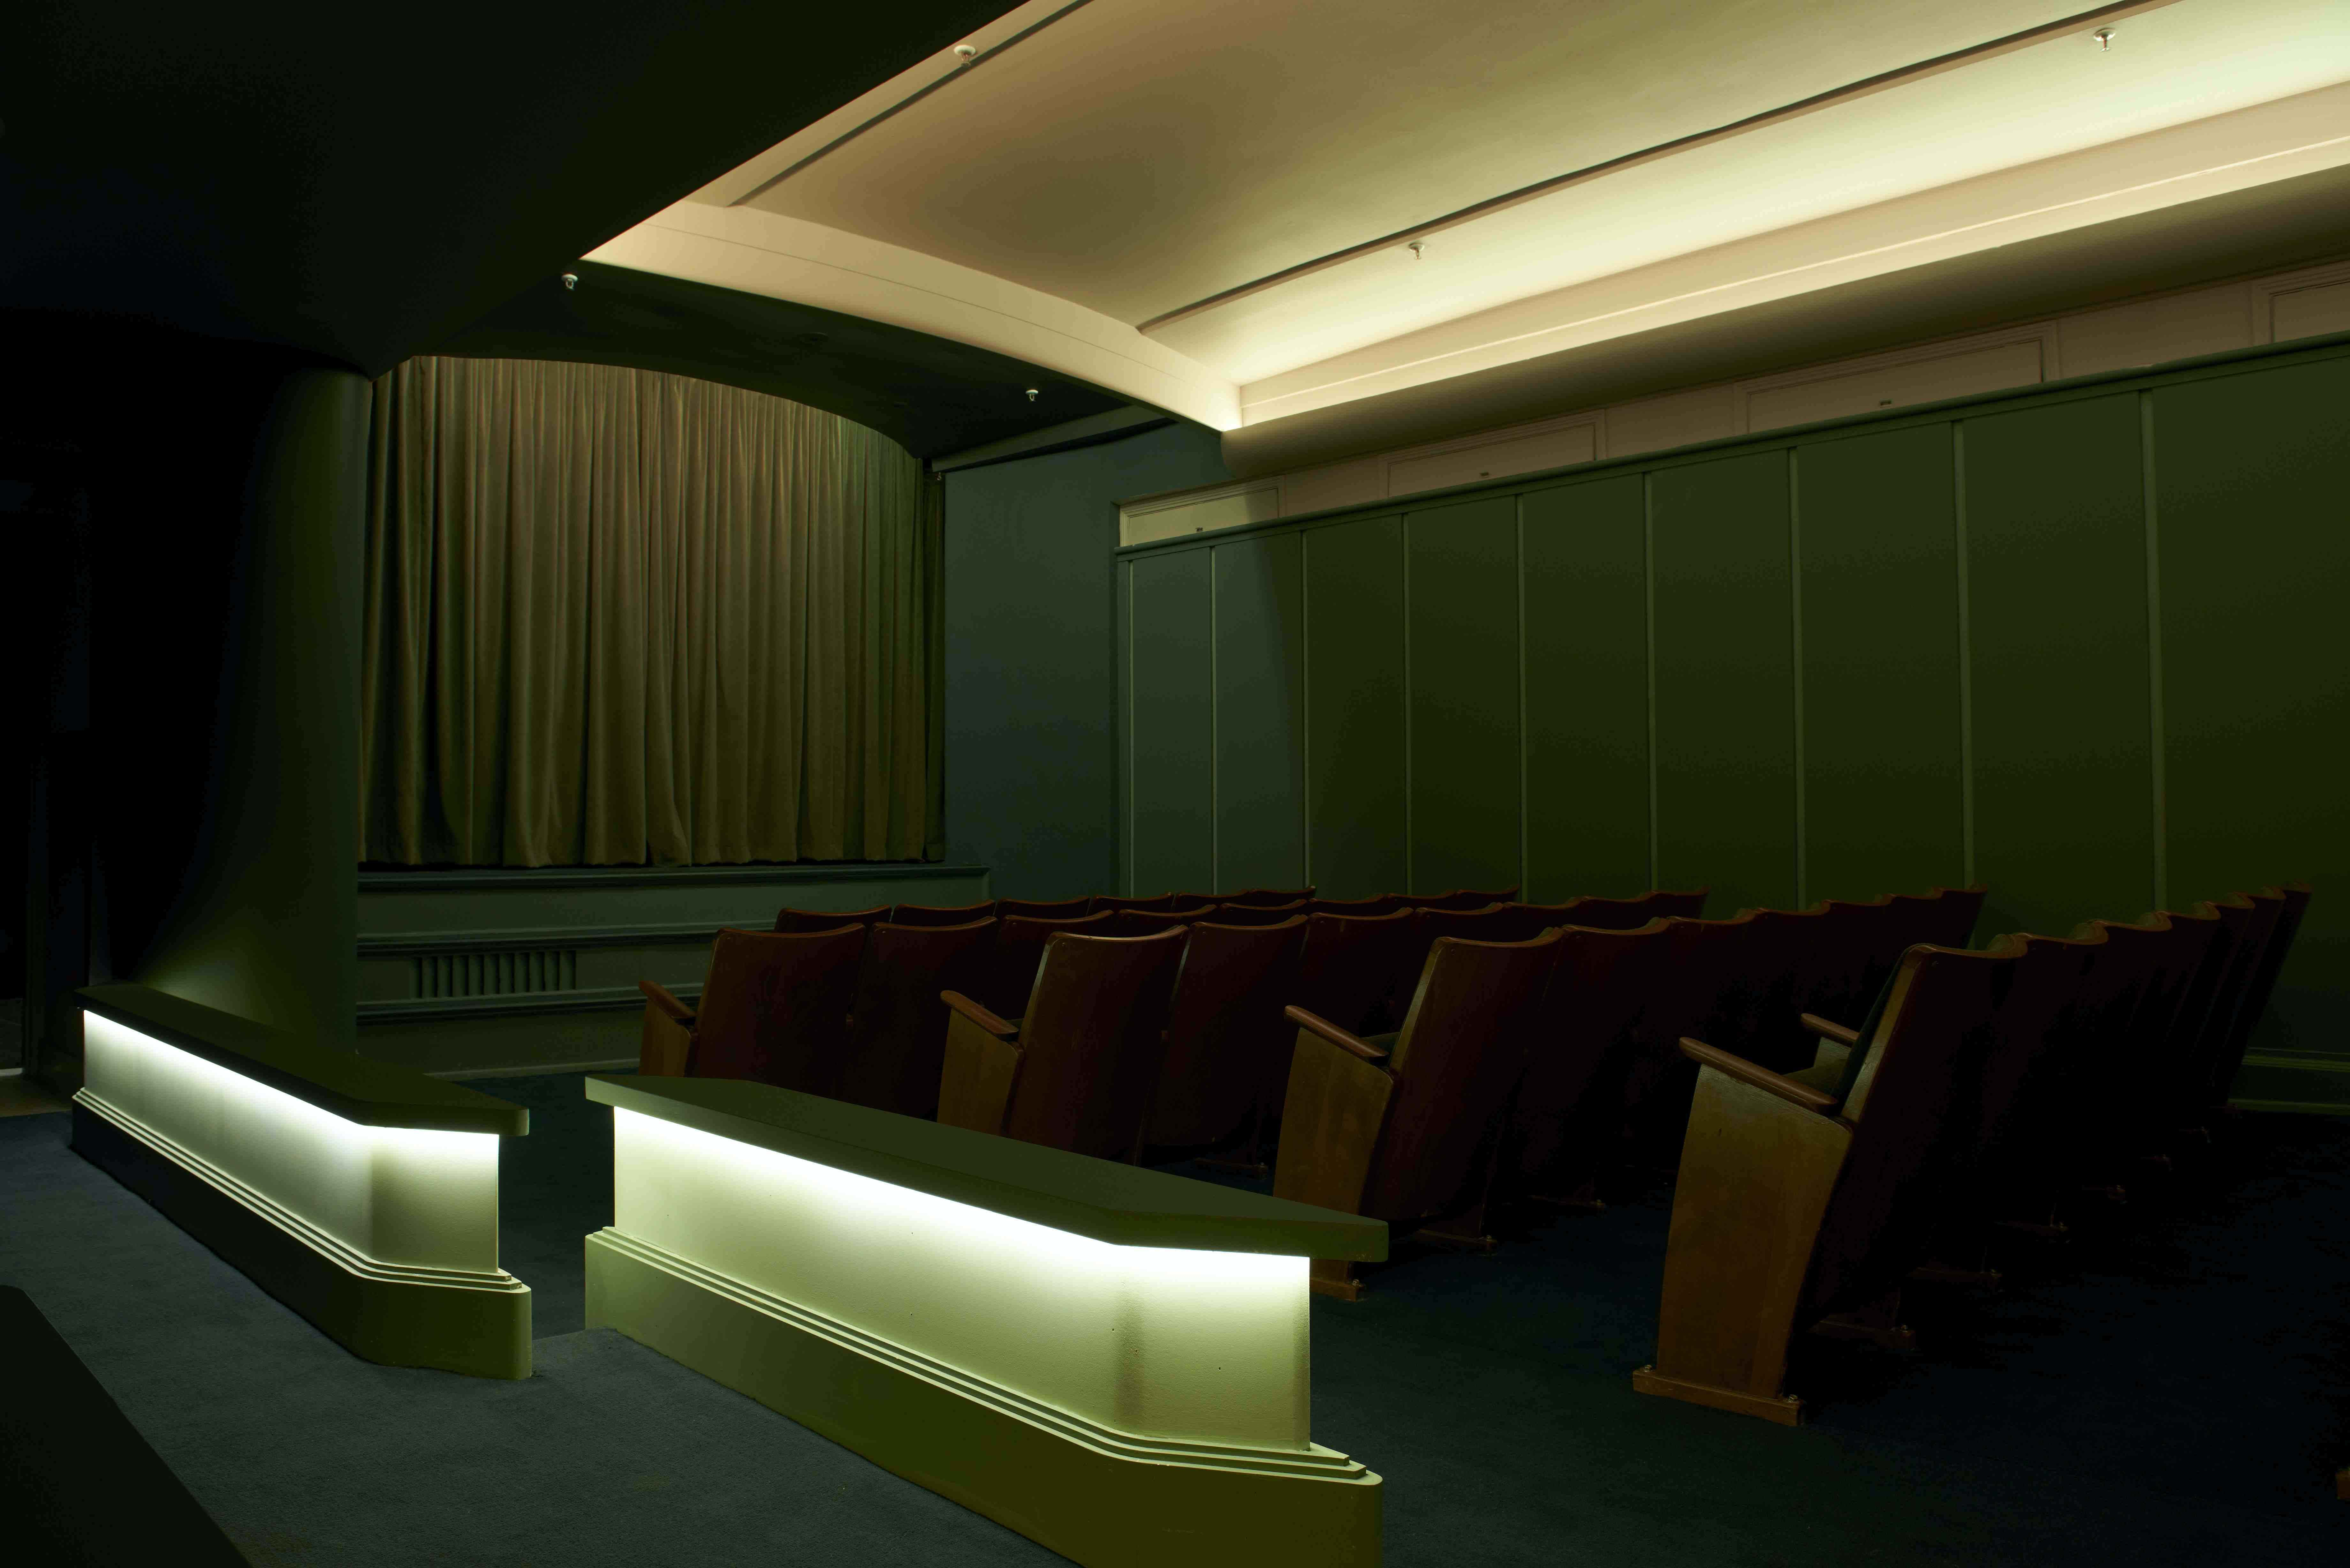 Cinema, Golden Age Cinema